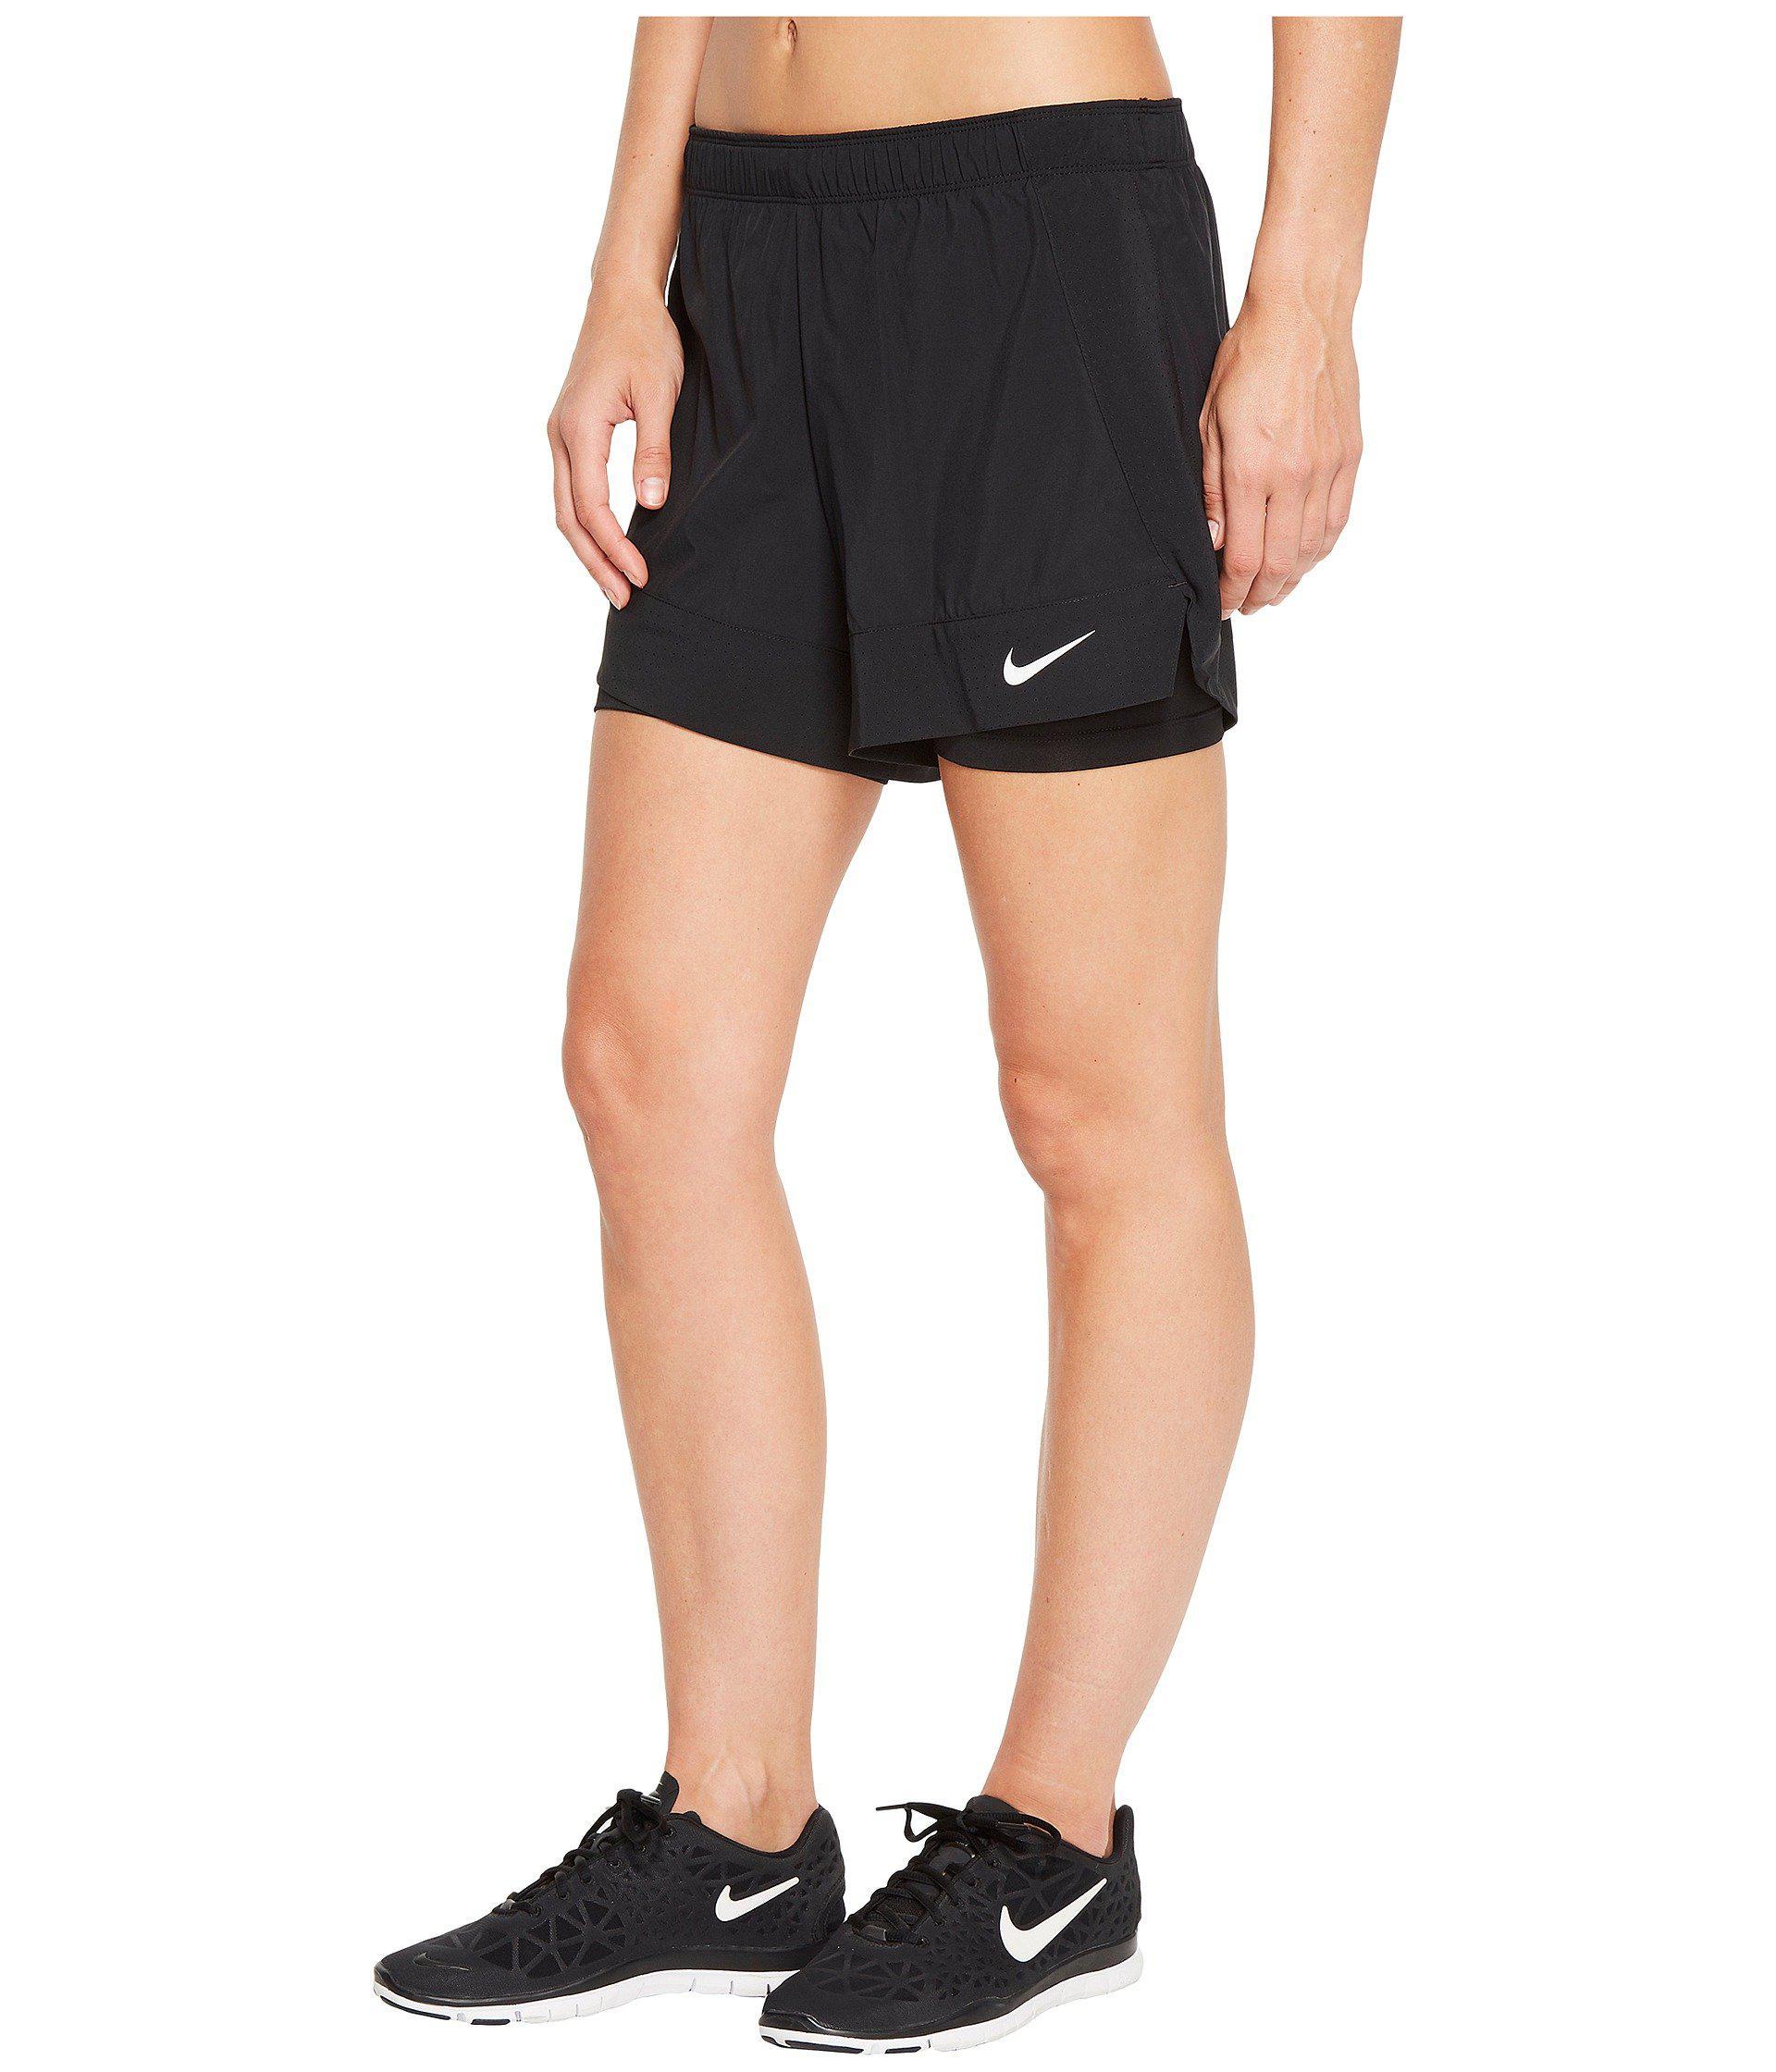 nike women's 2 in 1 shorts